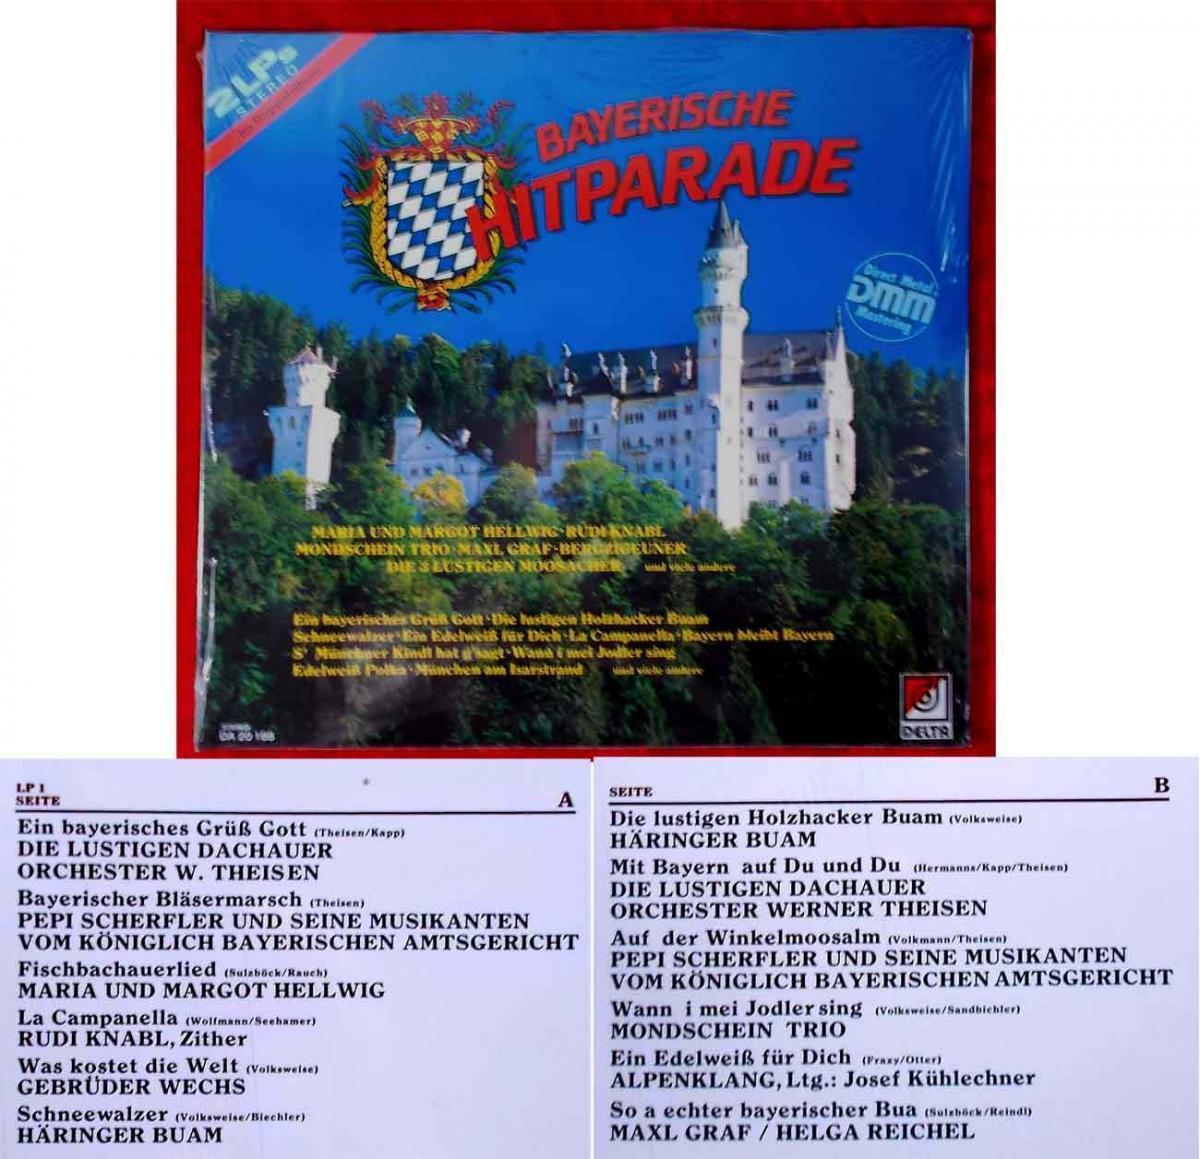 2LP Bayerische Hitparade (Delta DA 20 188) D 0